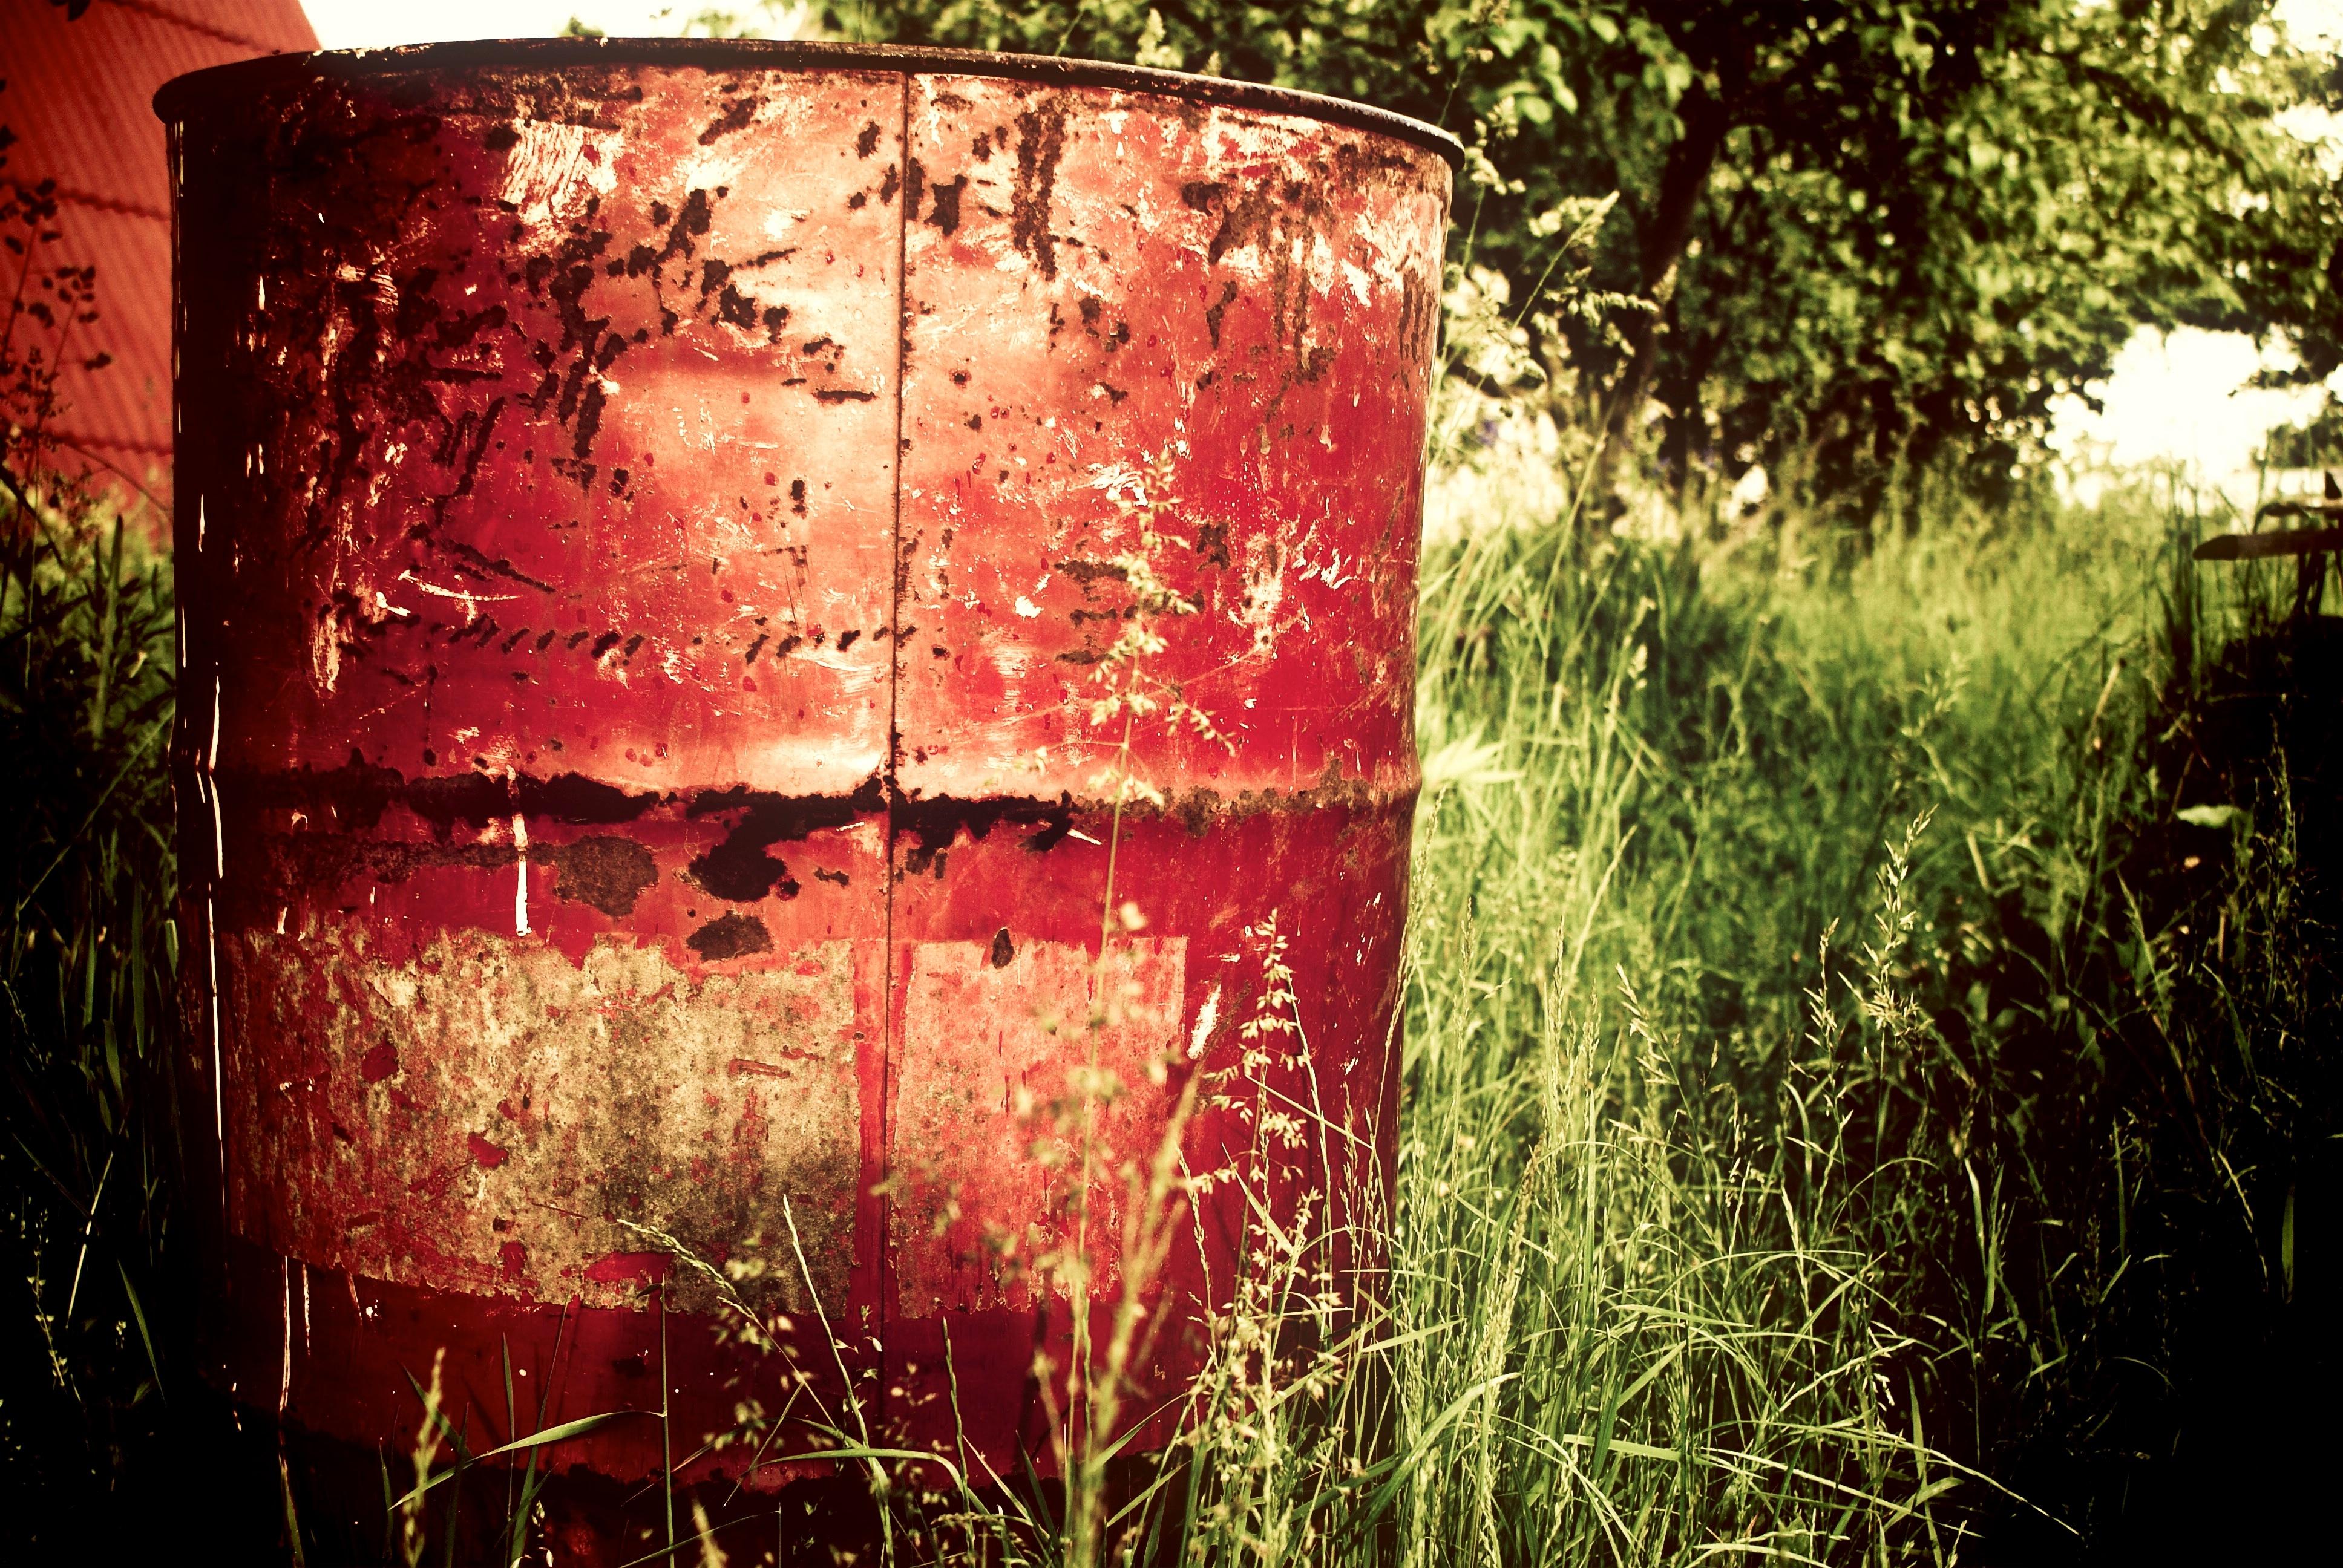 Red Drum, Rust, Round, Red, Drum, HQ Photo